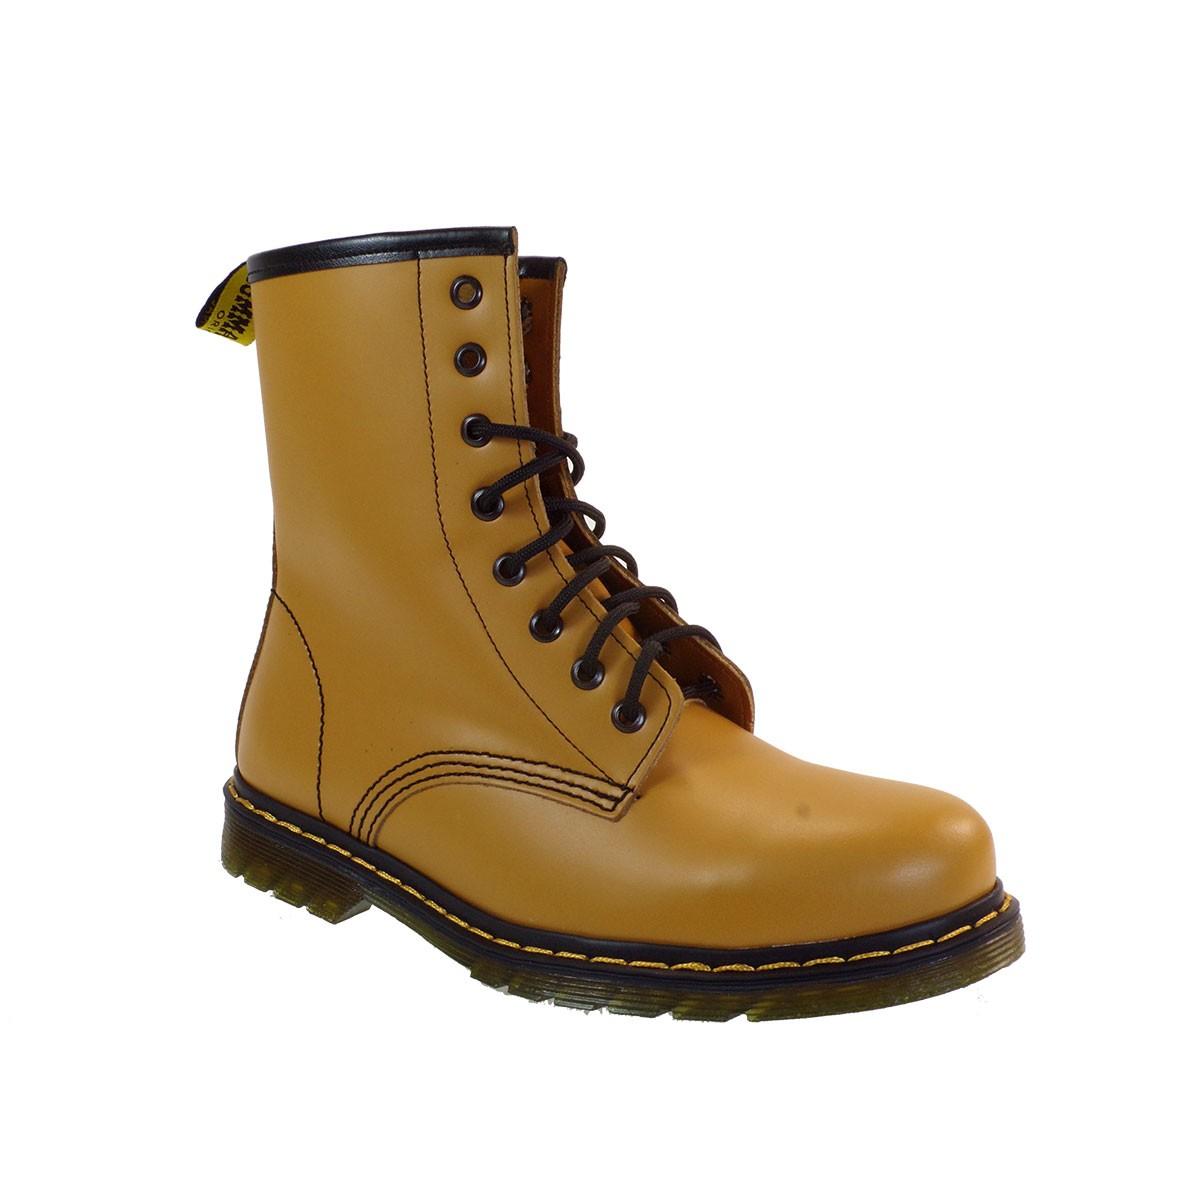 Commanchero Γυναικεία Παπούτσια Μποτάκια Αρβυλάκια 515 Κίτρινο Δέρμα